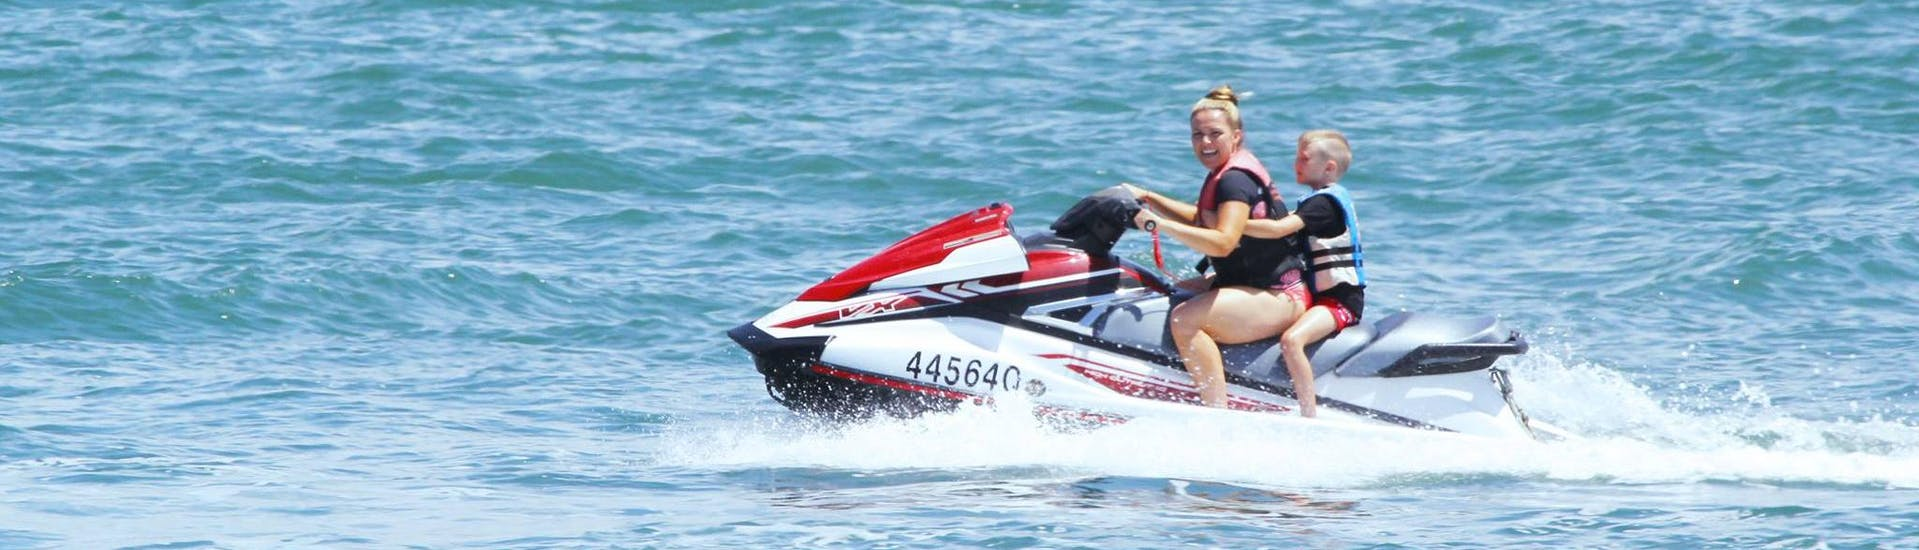 jet-ski-on-gold-coast-1-5-h-tour-gold-coast-watersports-hero